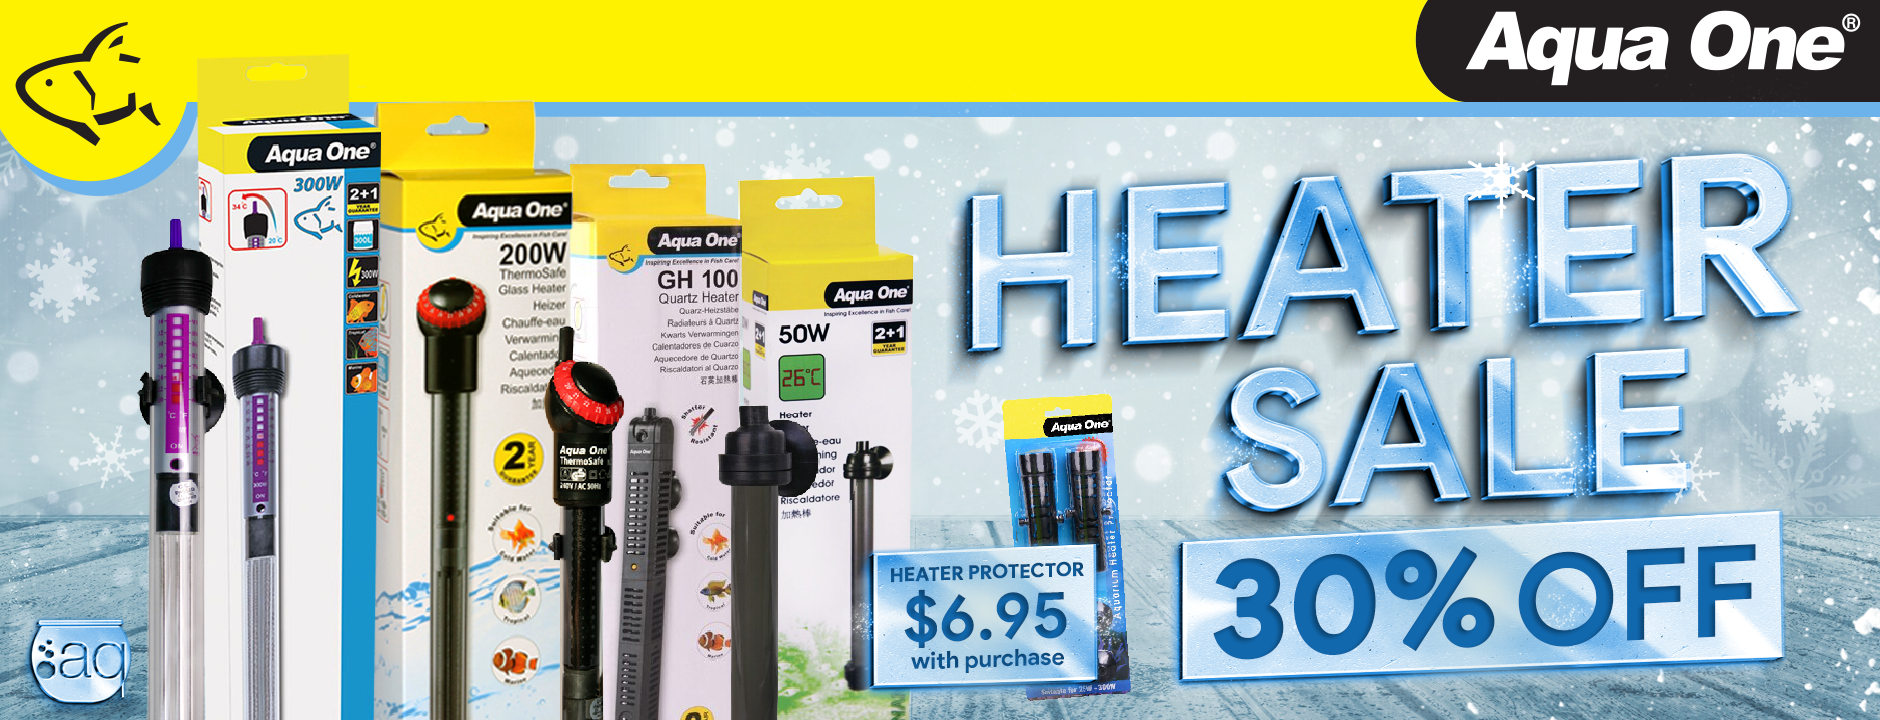 aqua-one-winter-heater-sale-banner.png